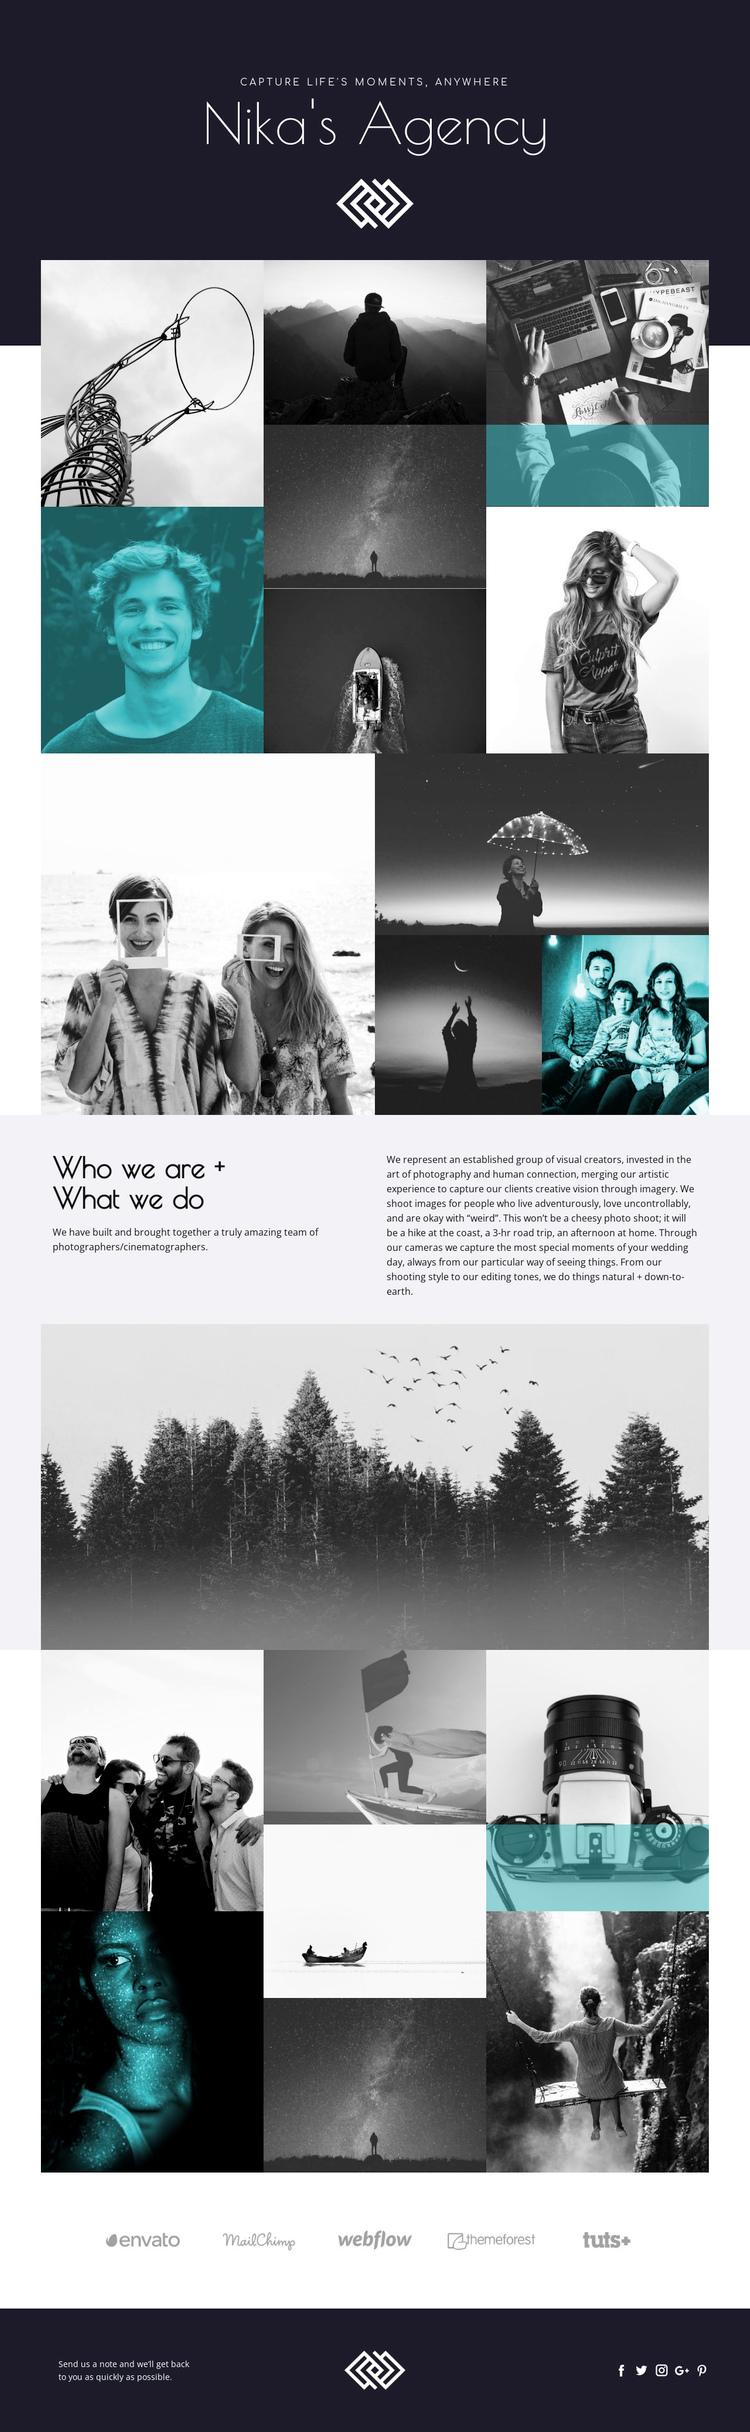 Nika's Agency Website Builder Software